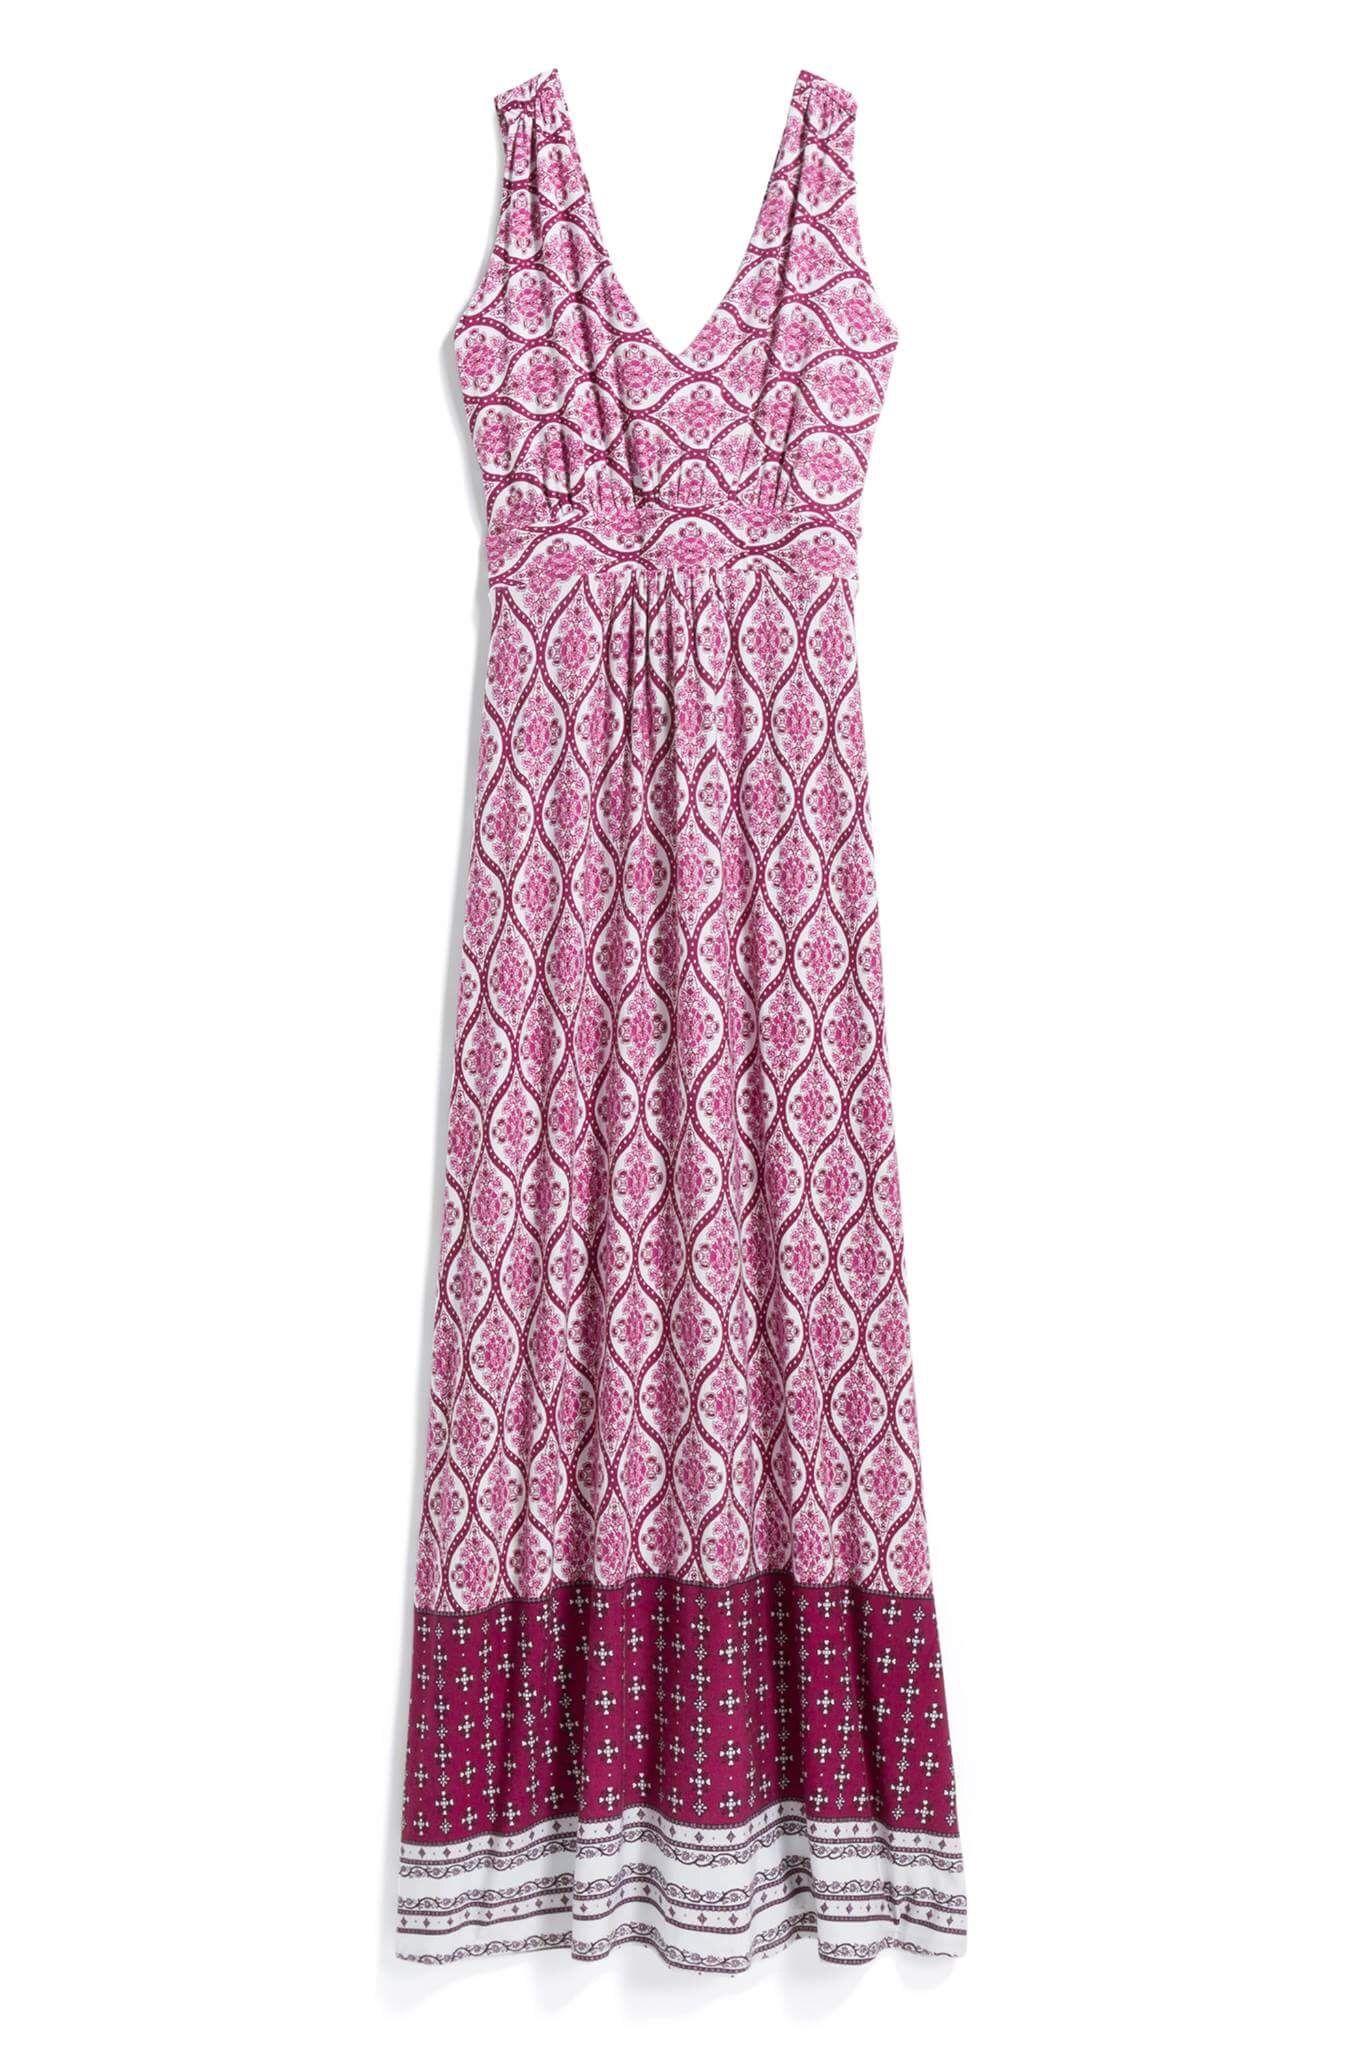 Stitch fix style quiz threads pinterest pink maxi maxi